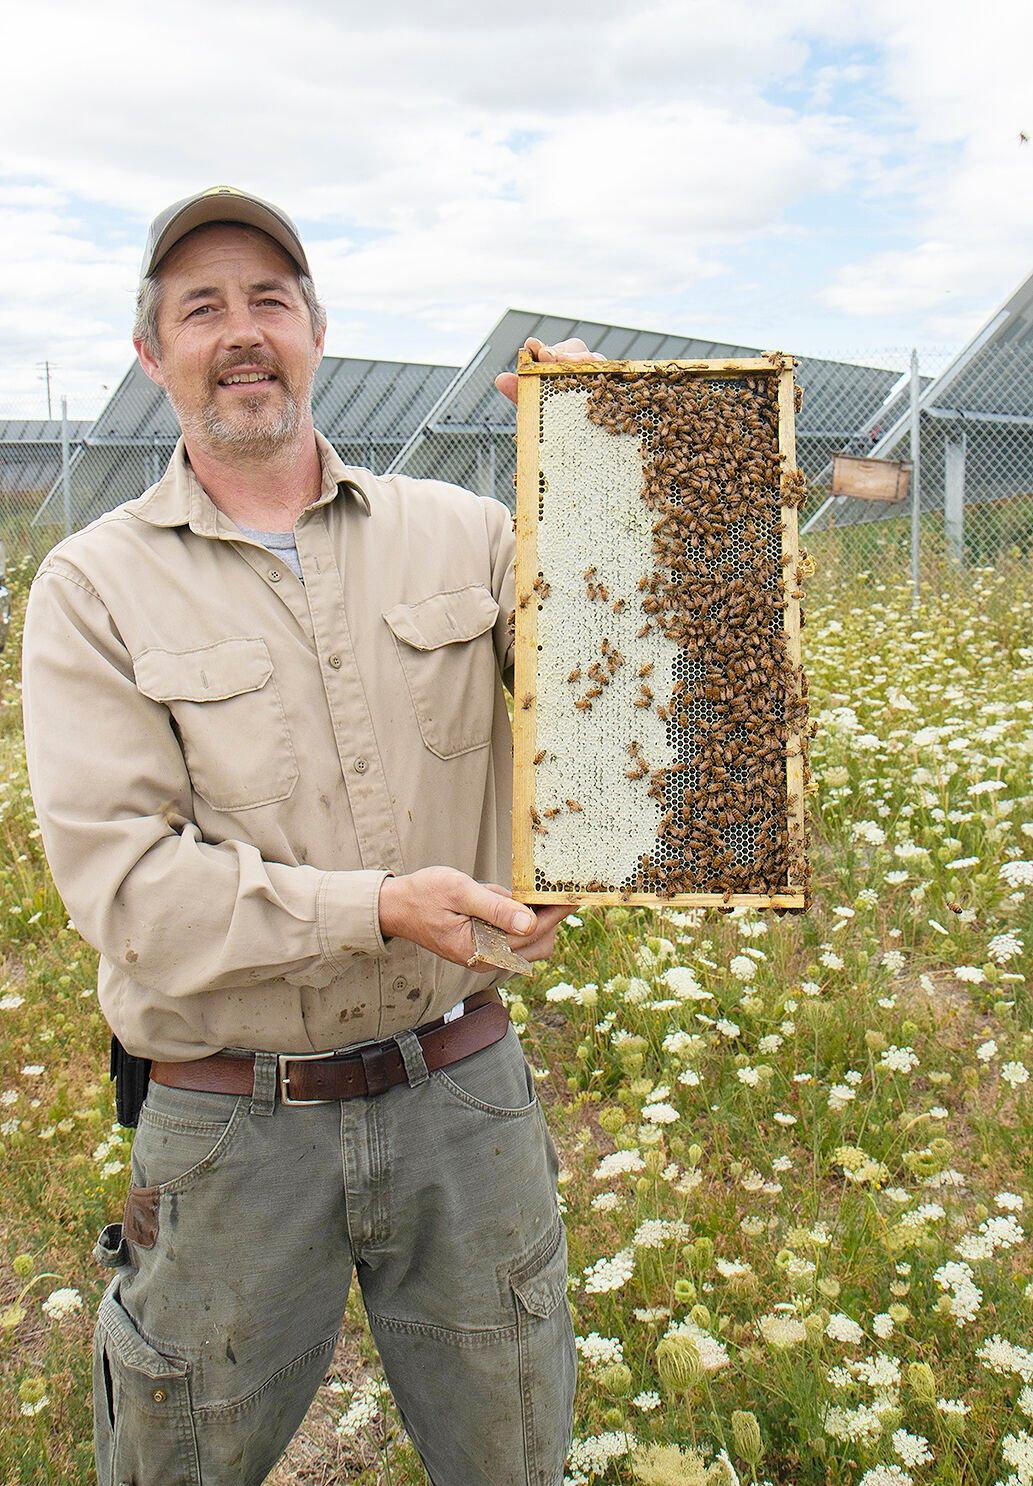 SM honeycomb